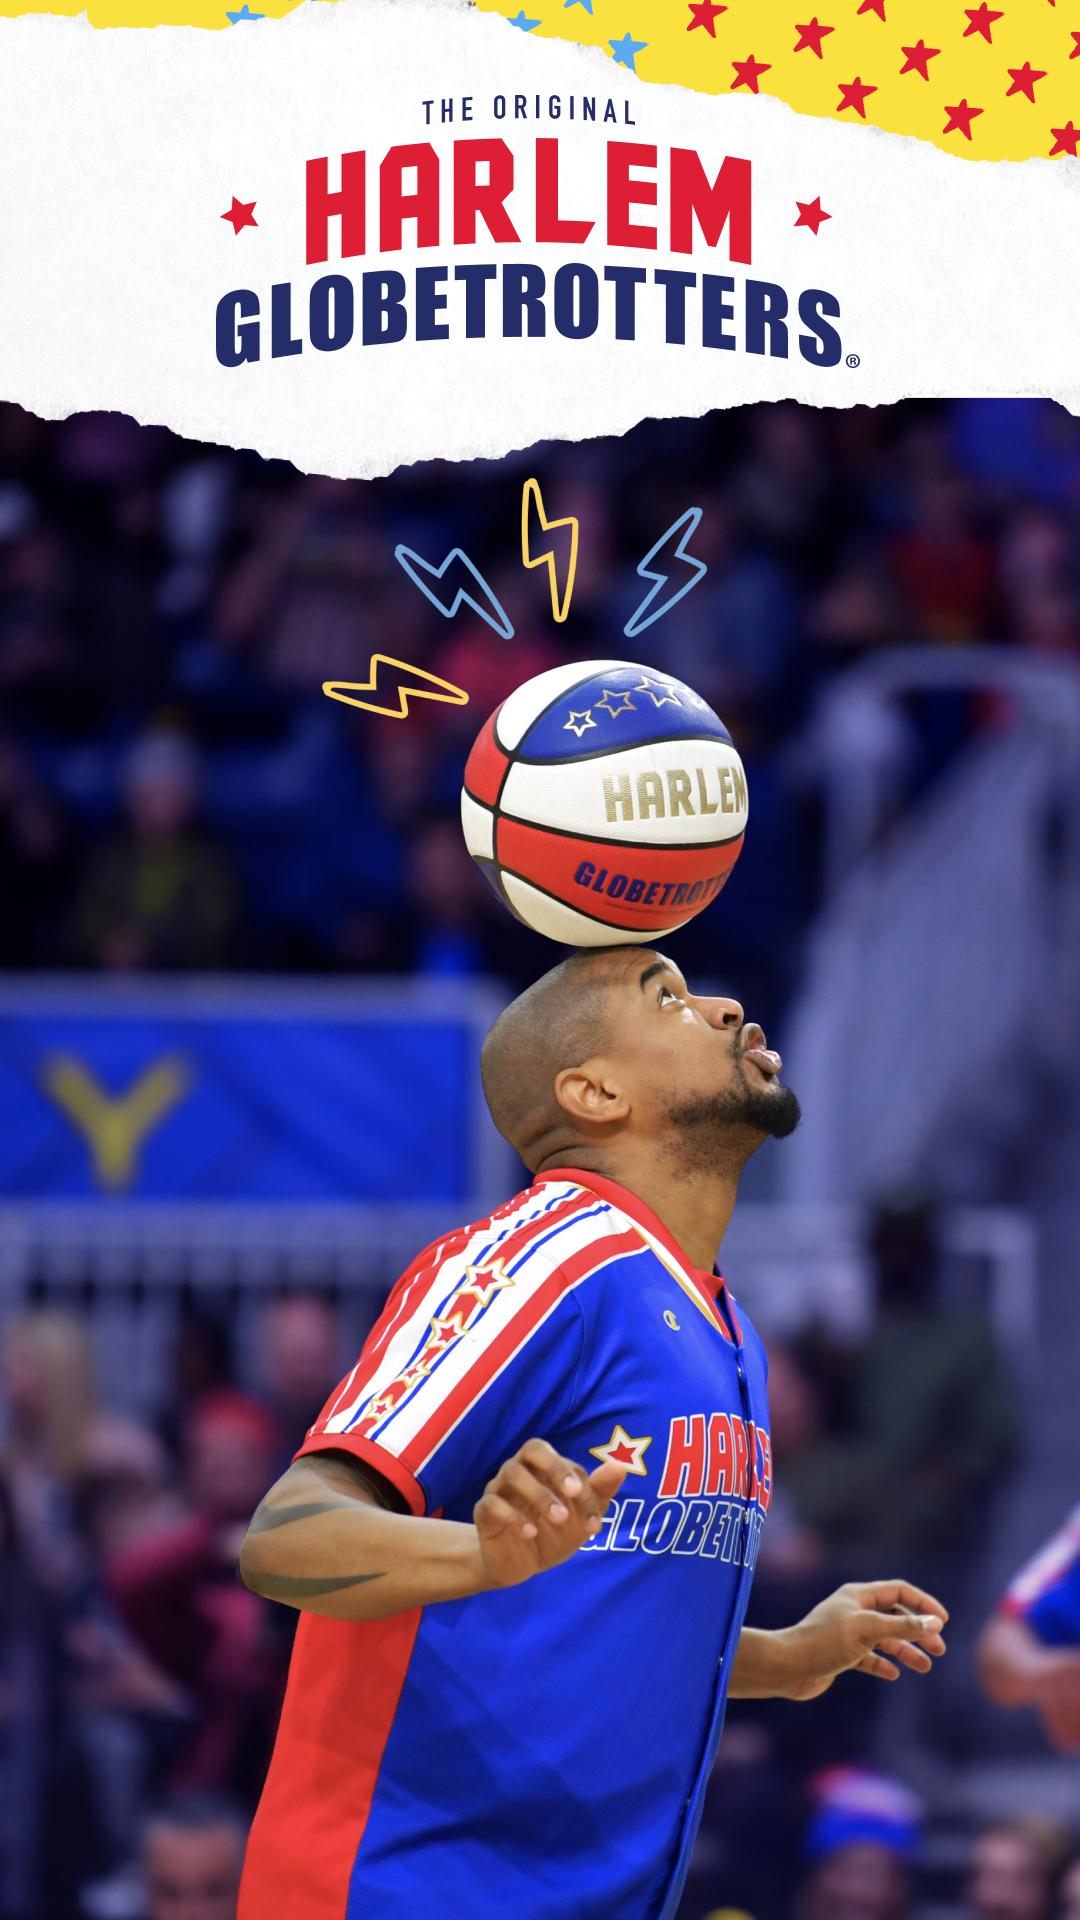 harlem globetrotters balancing ball on the head